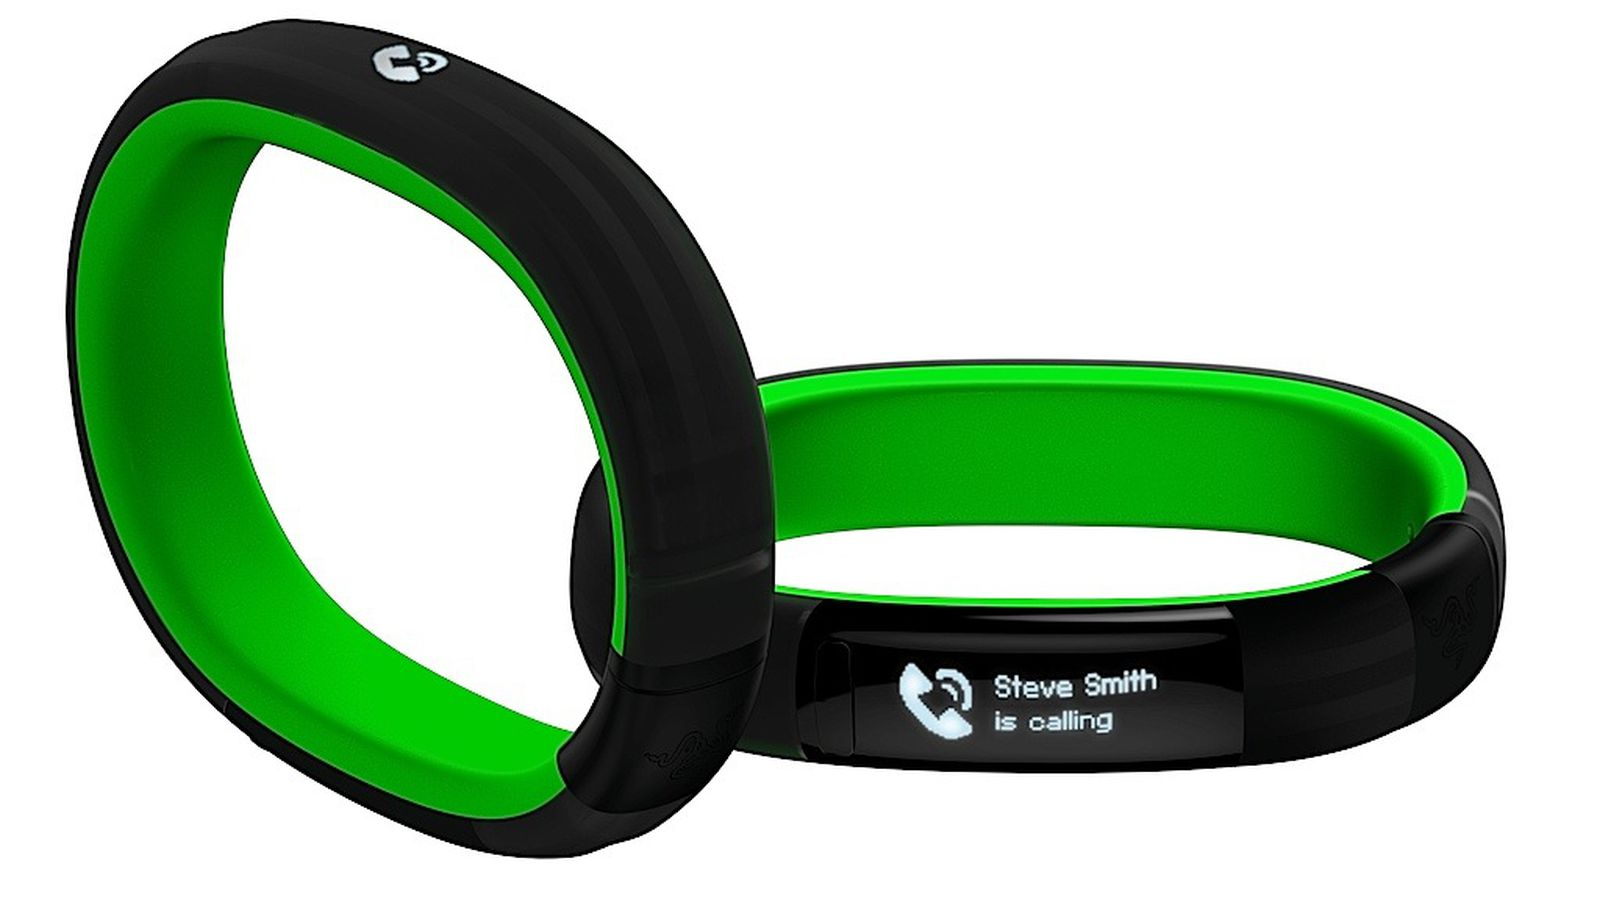 Razer tries its hand at wristbands with the Nabu SmartBand ...